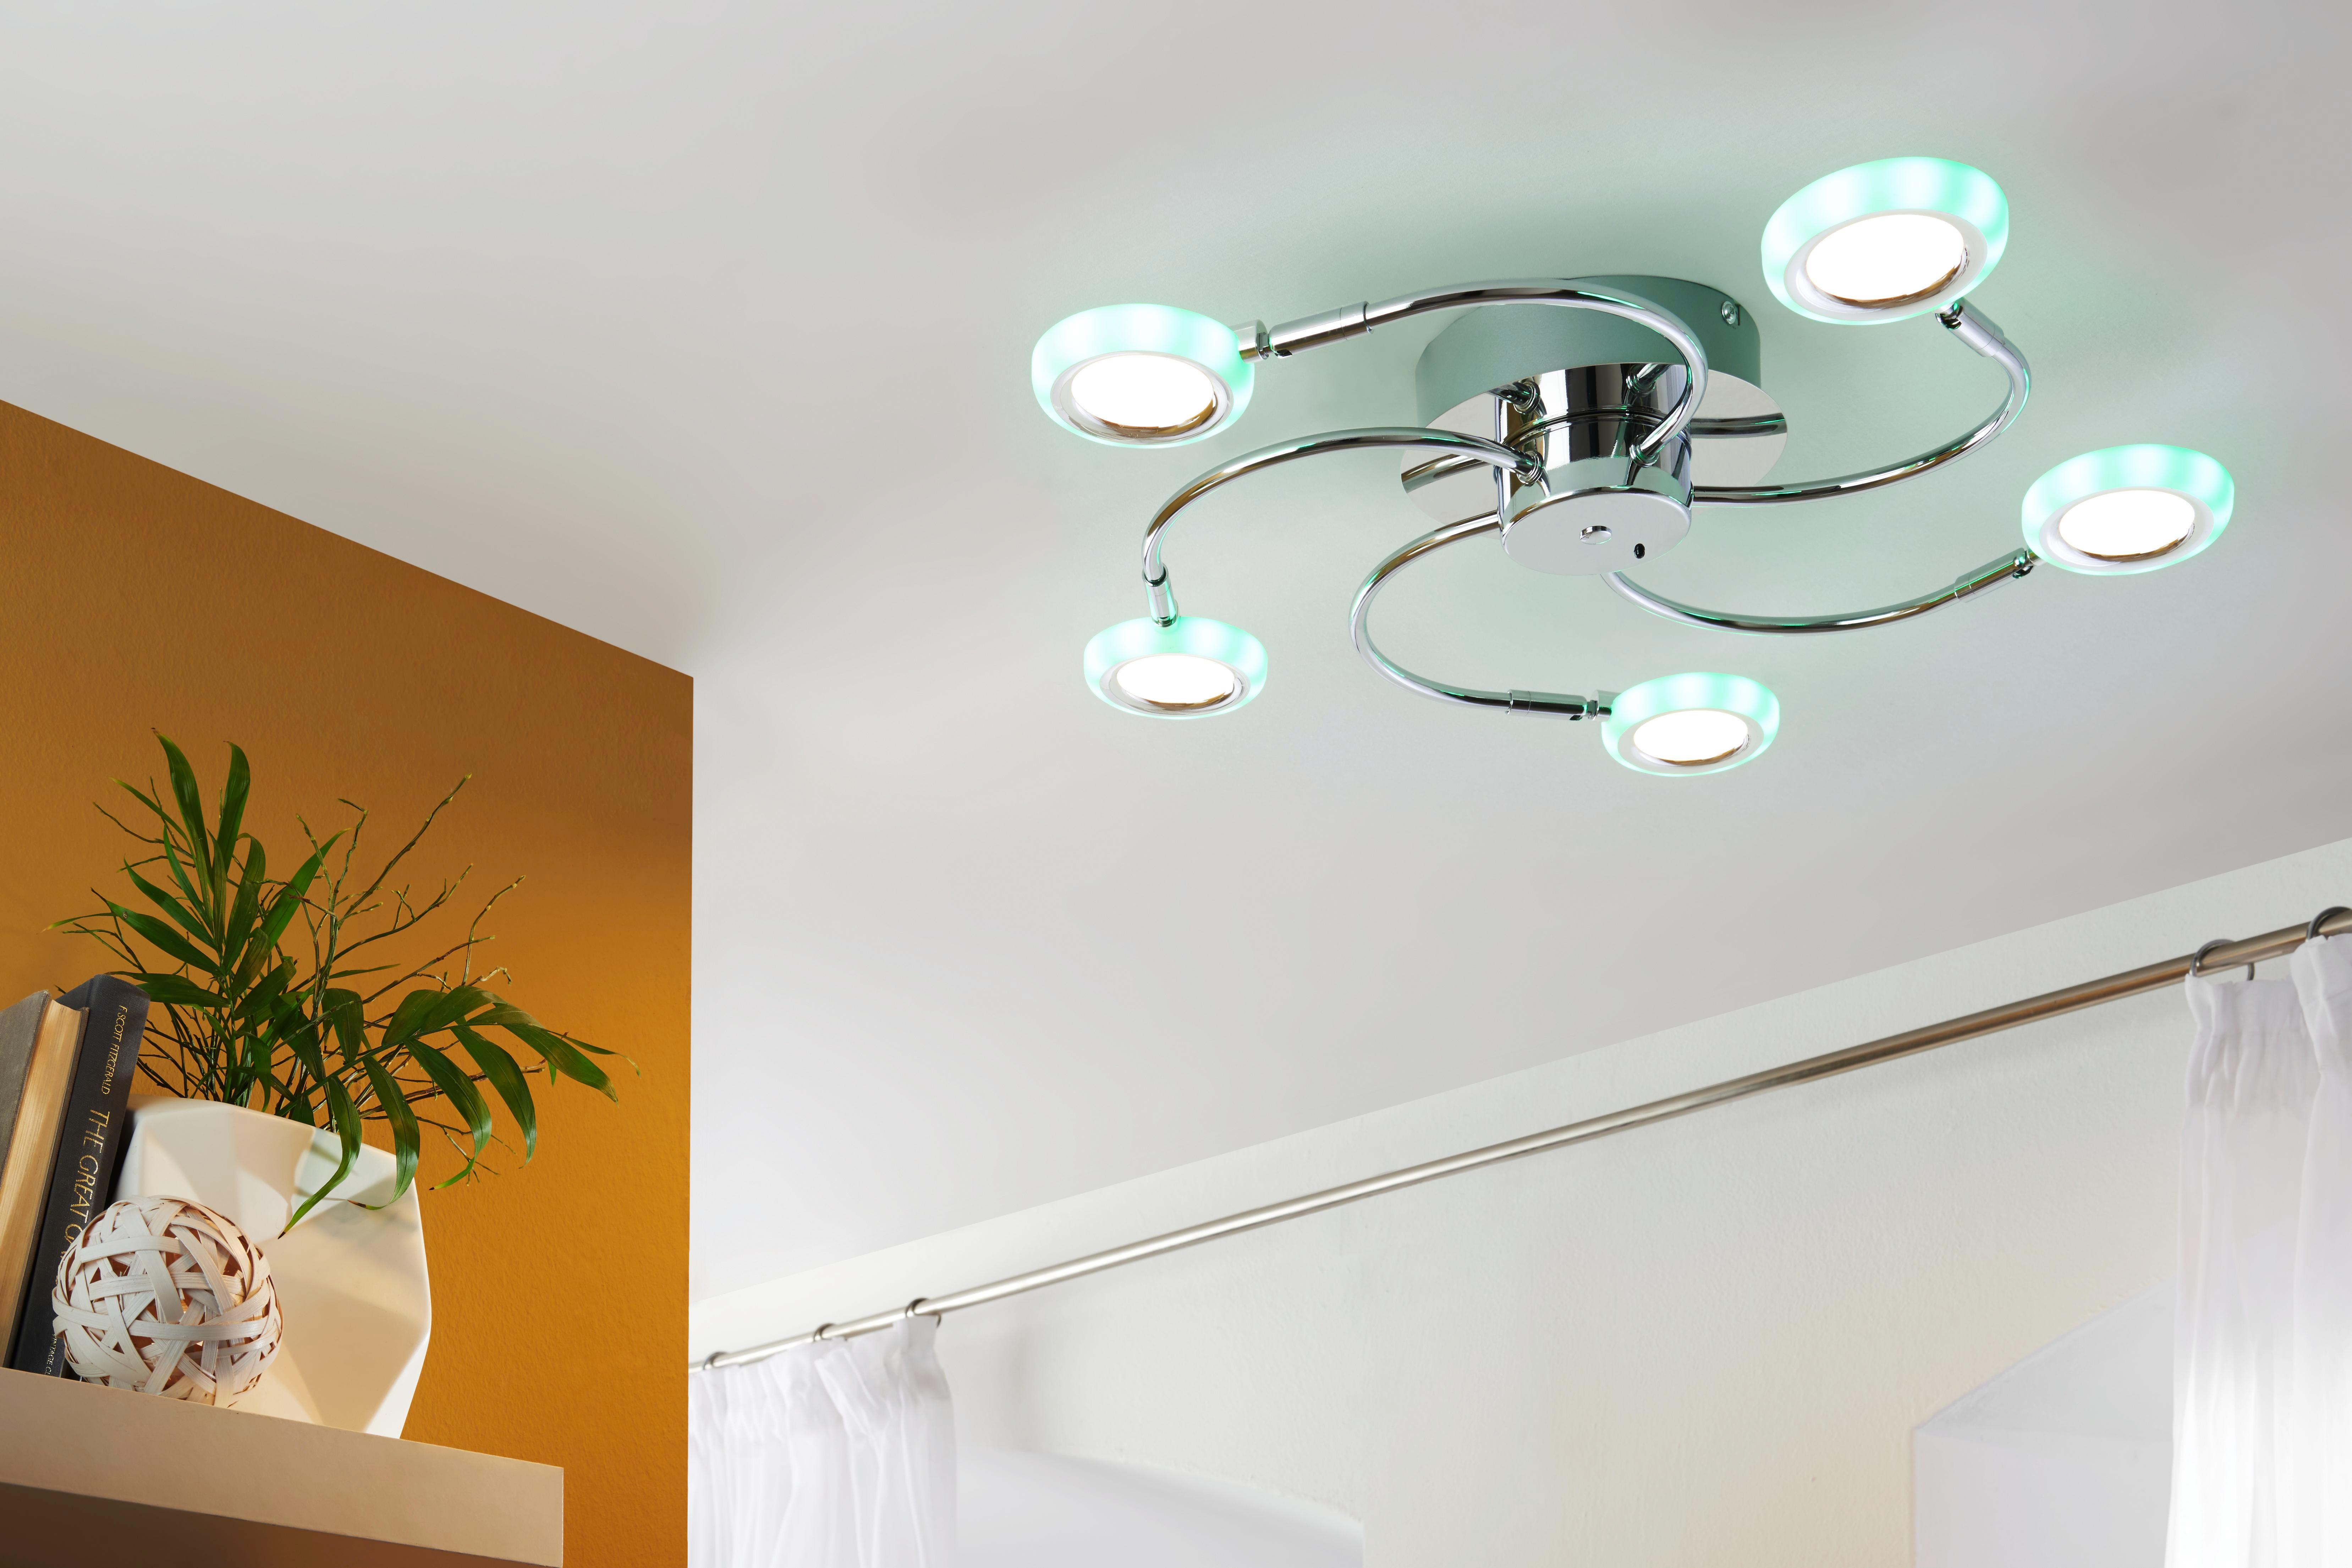 LED-DECKENLEUCHTE - Chromfarben, LIFESTYLE, Metall (63/8,0cm) - NOVEL